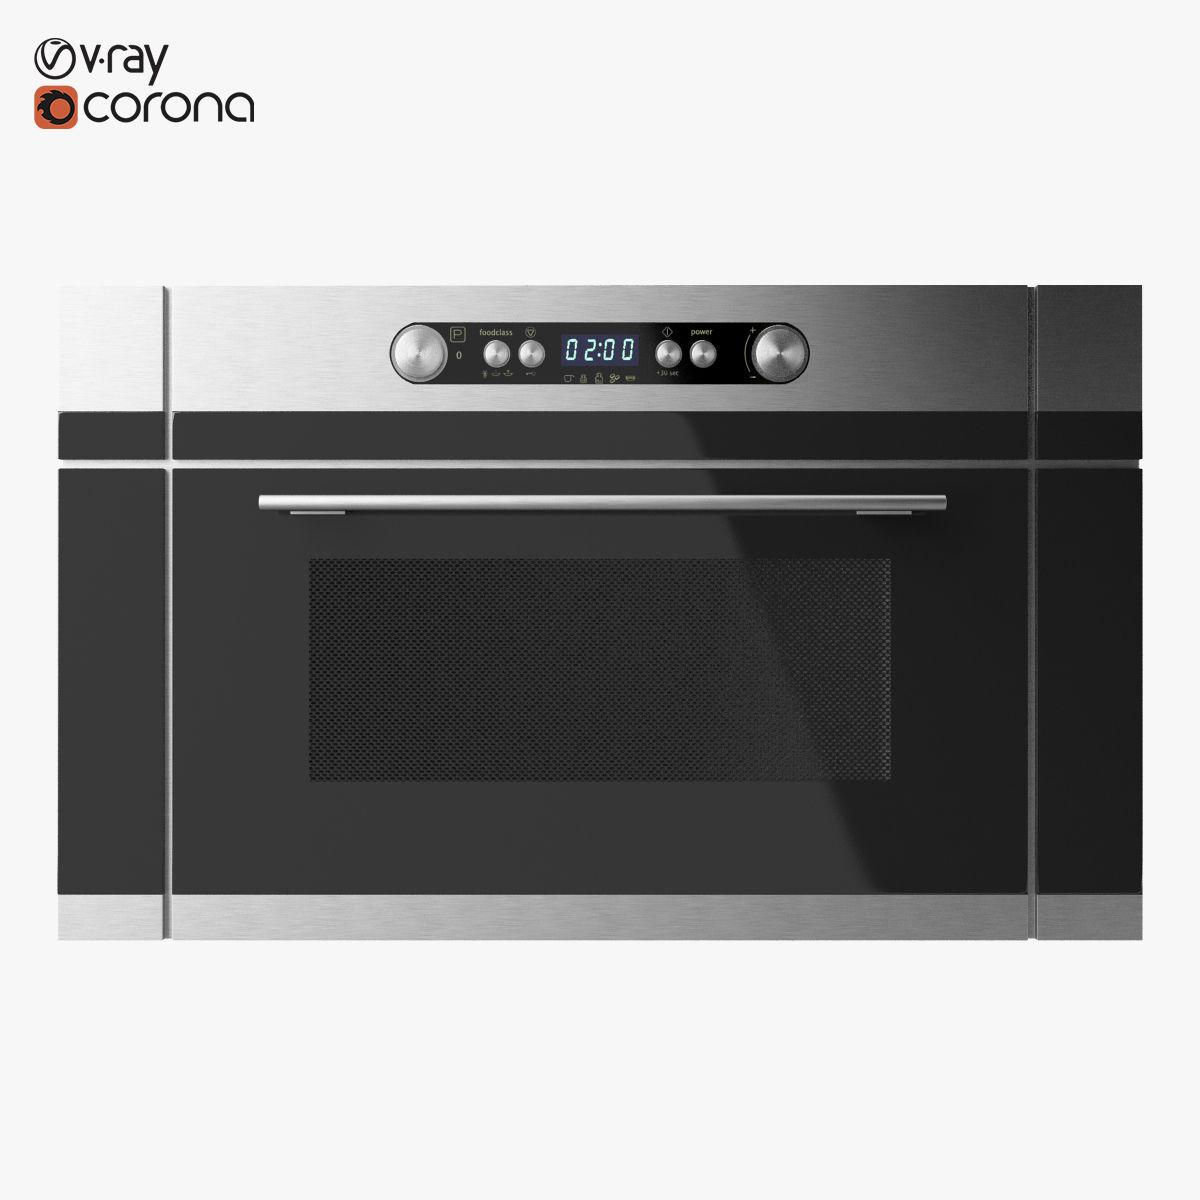 Nutid Microwave Oven